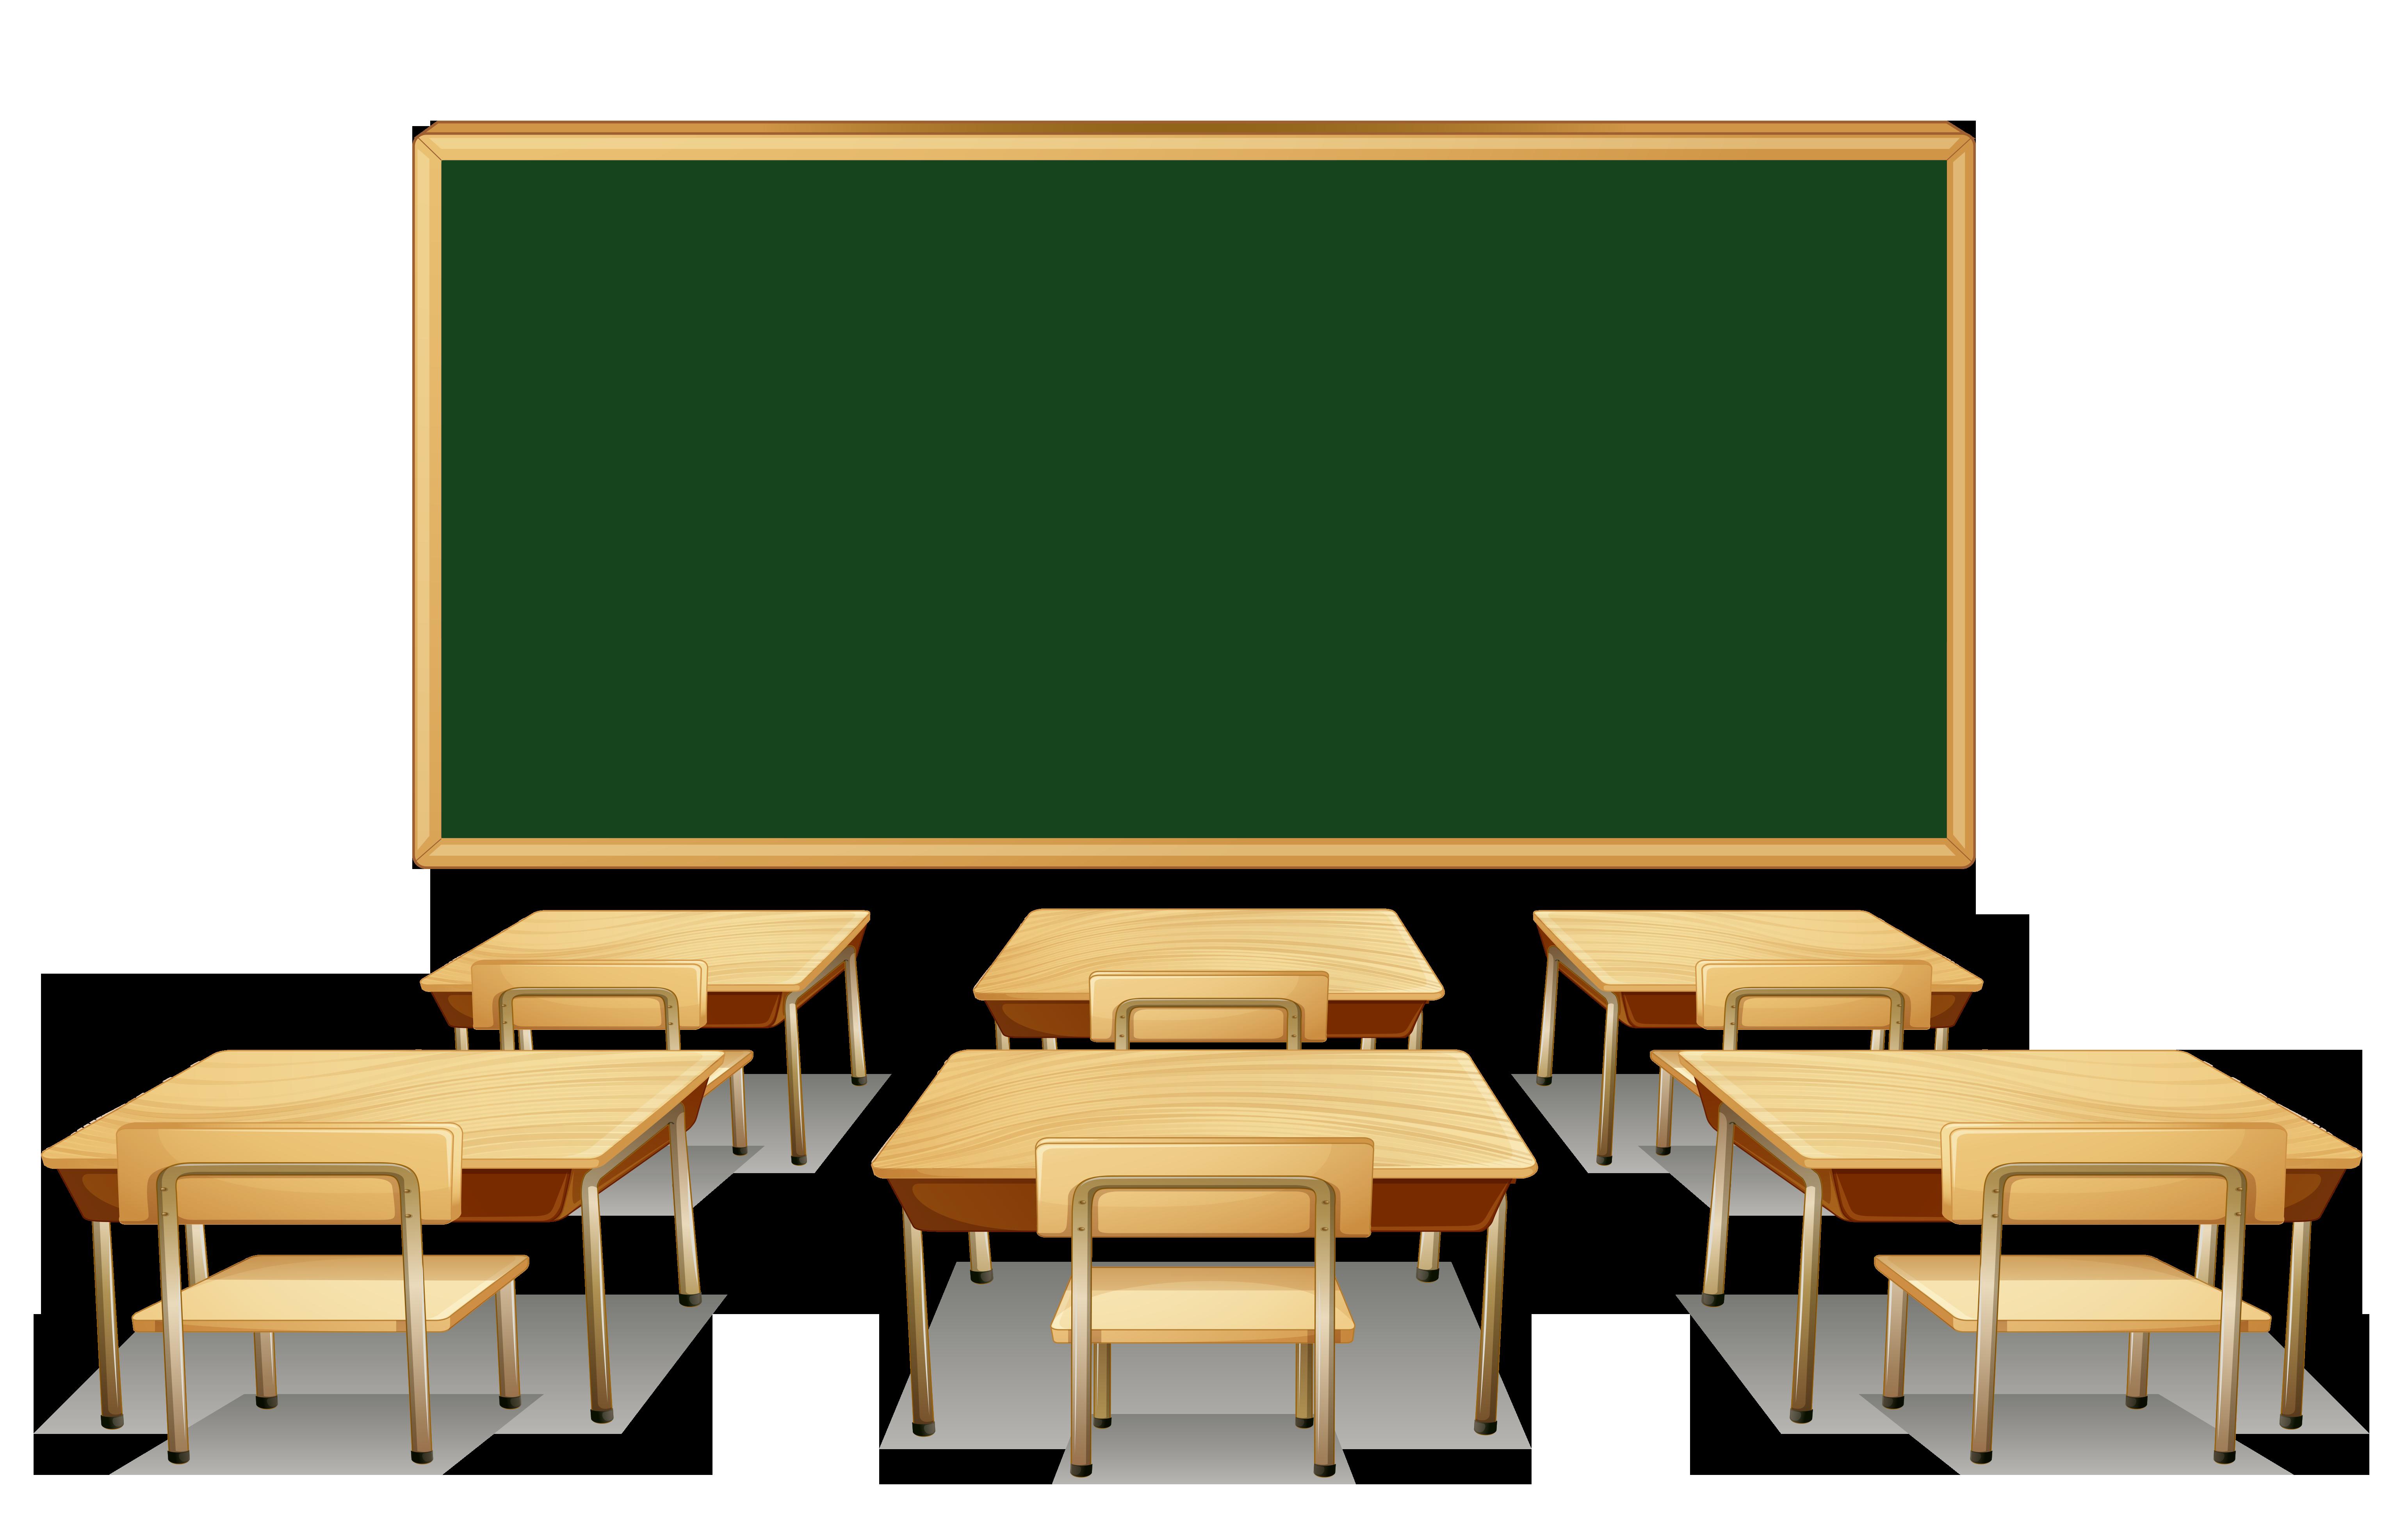 free classroom clipart-free classroom clipart-7